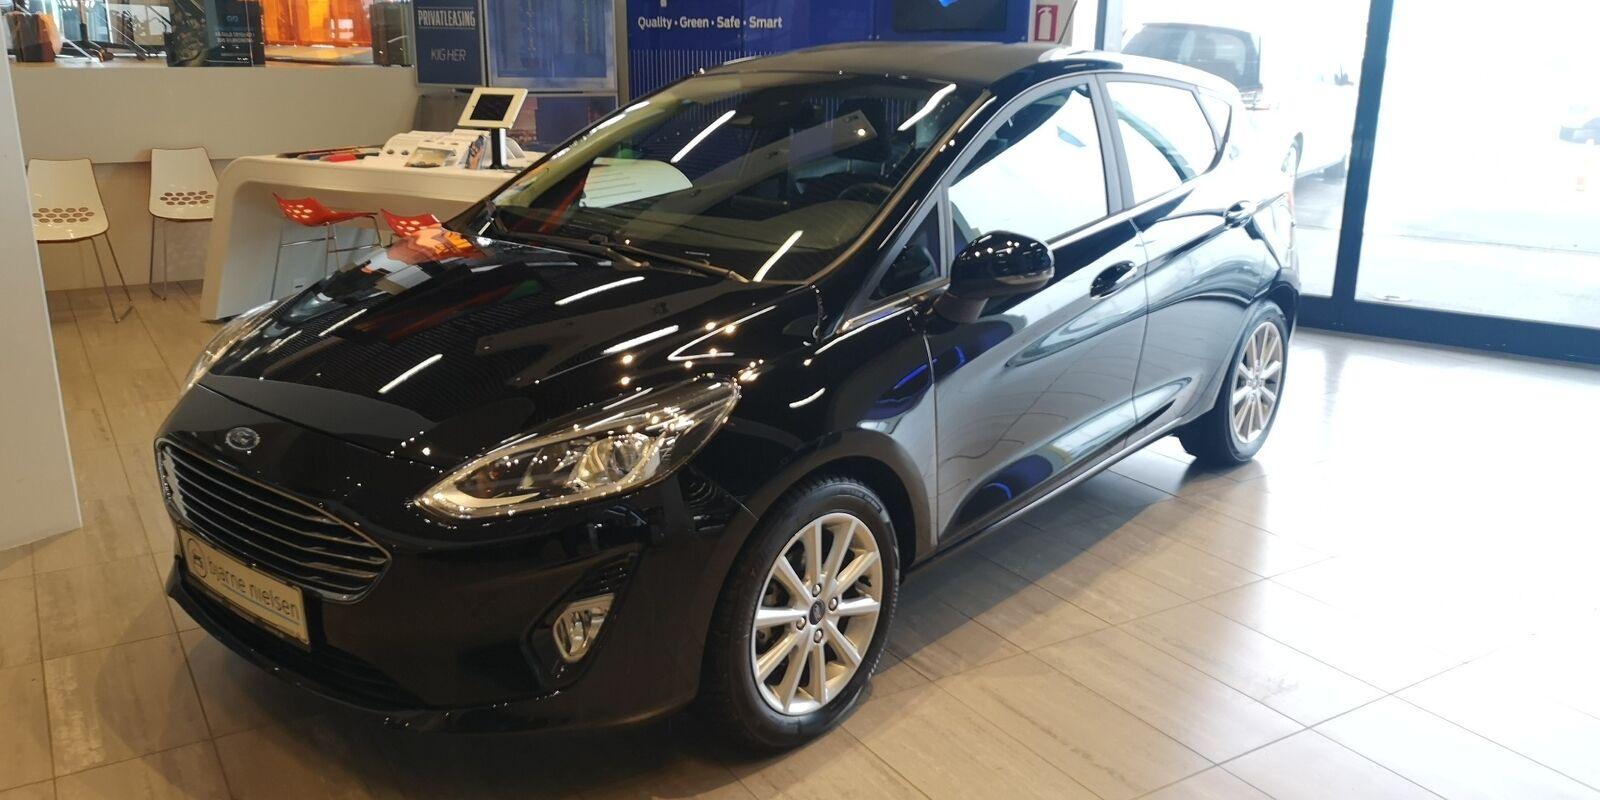 Ford Fiesta Billede 6